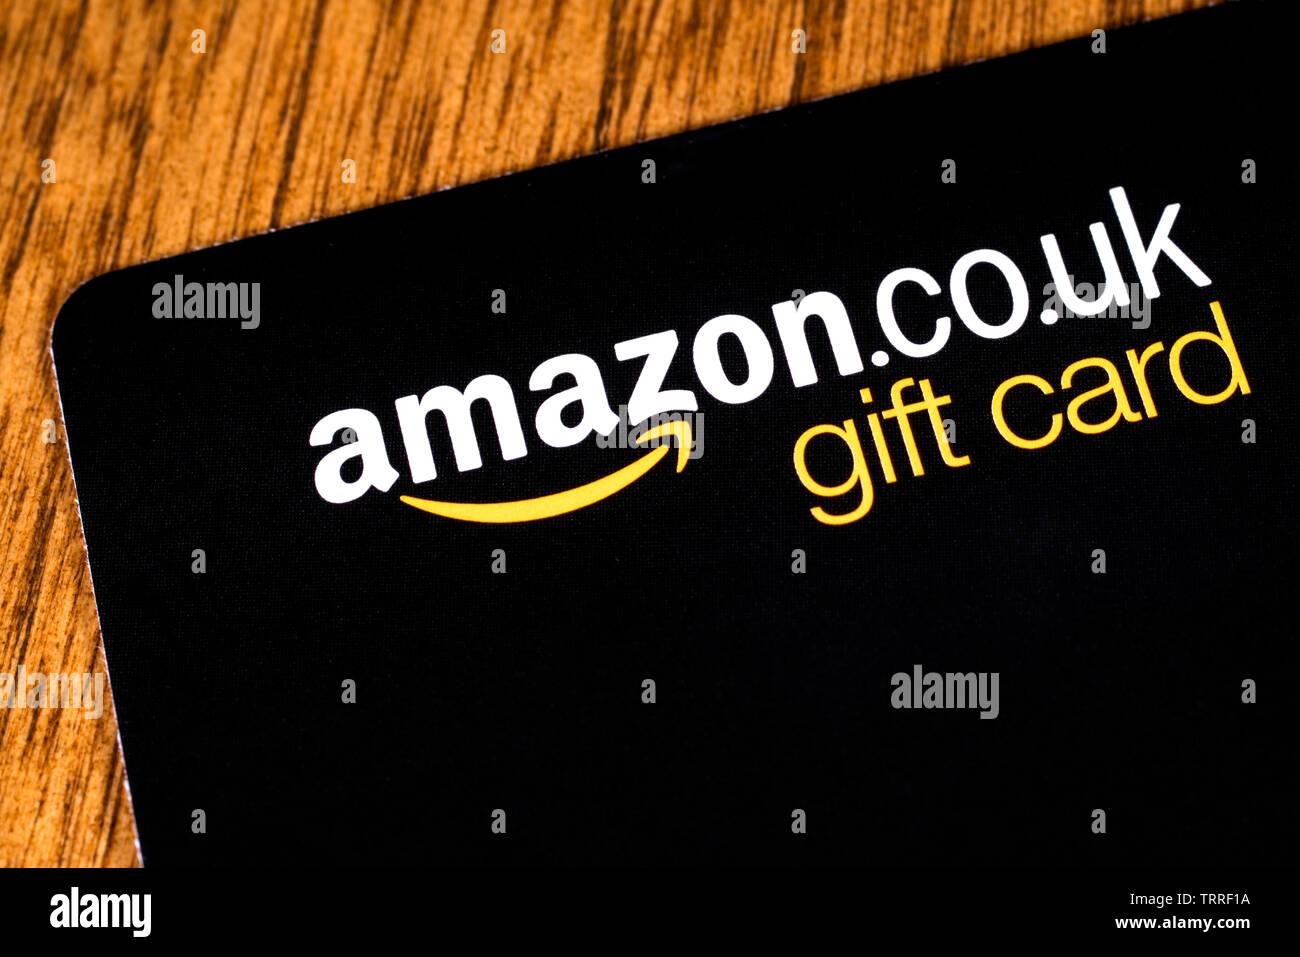 Amazon Gift Card Stock Photos & Amazon Gift Card Stock